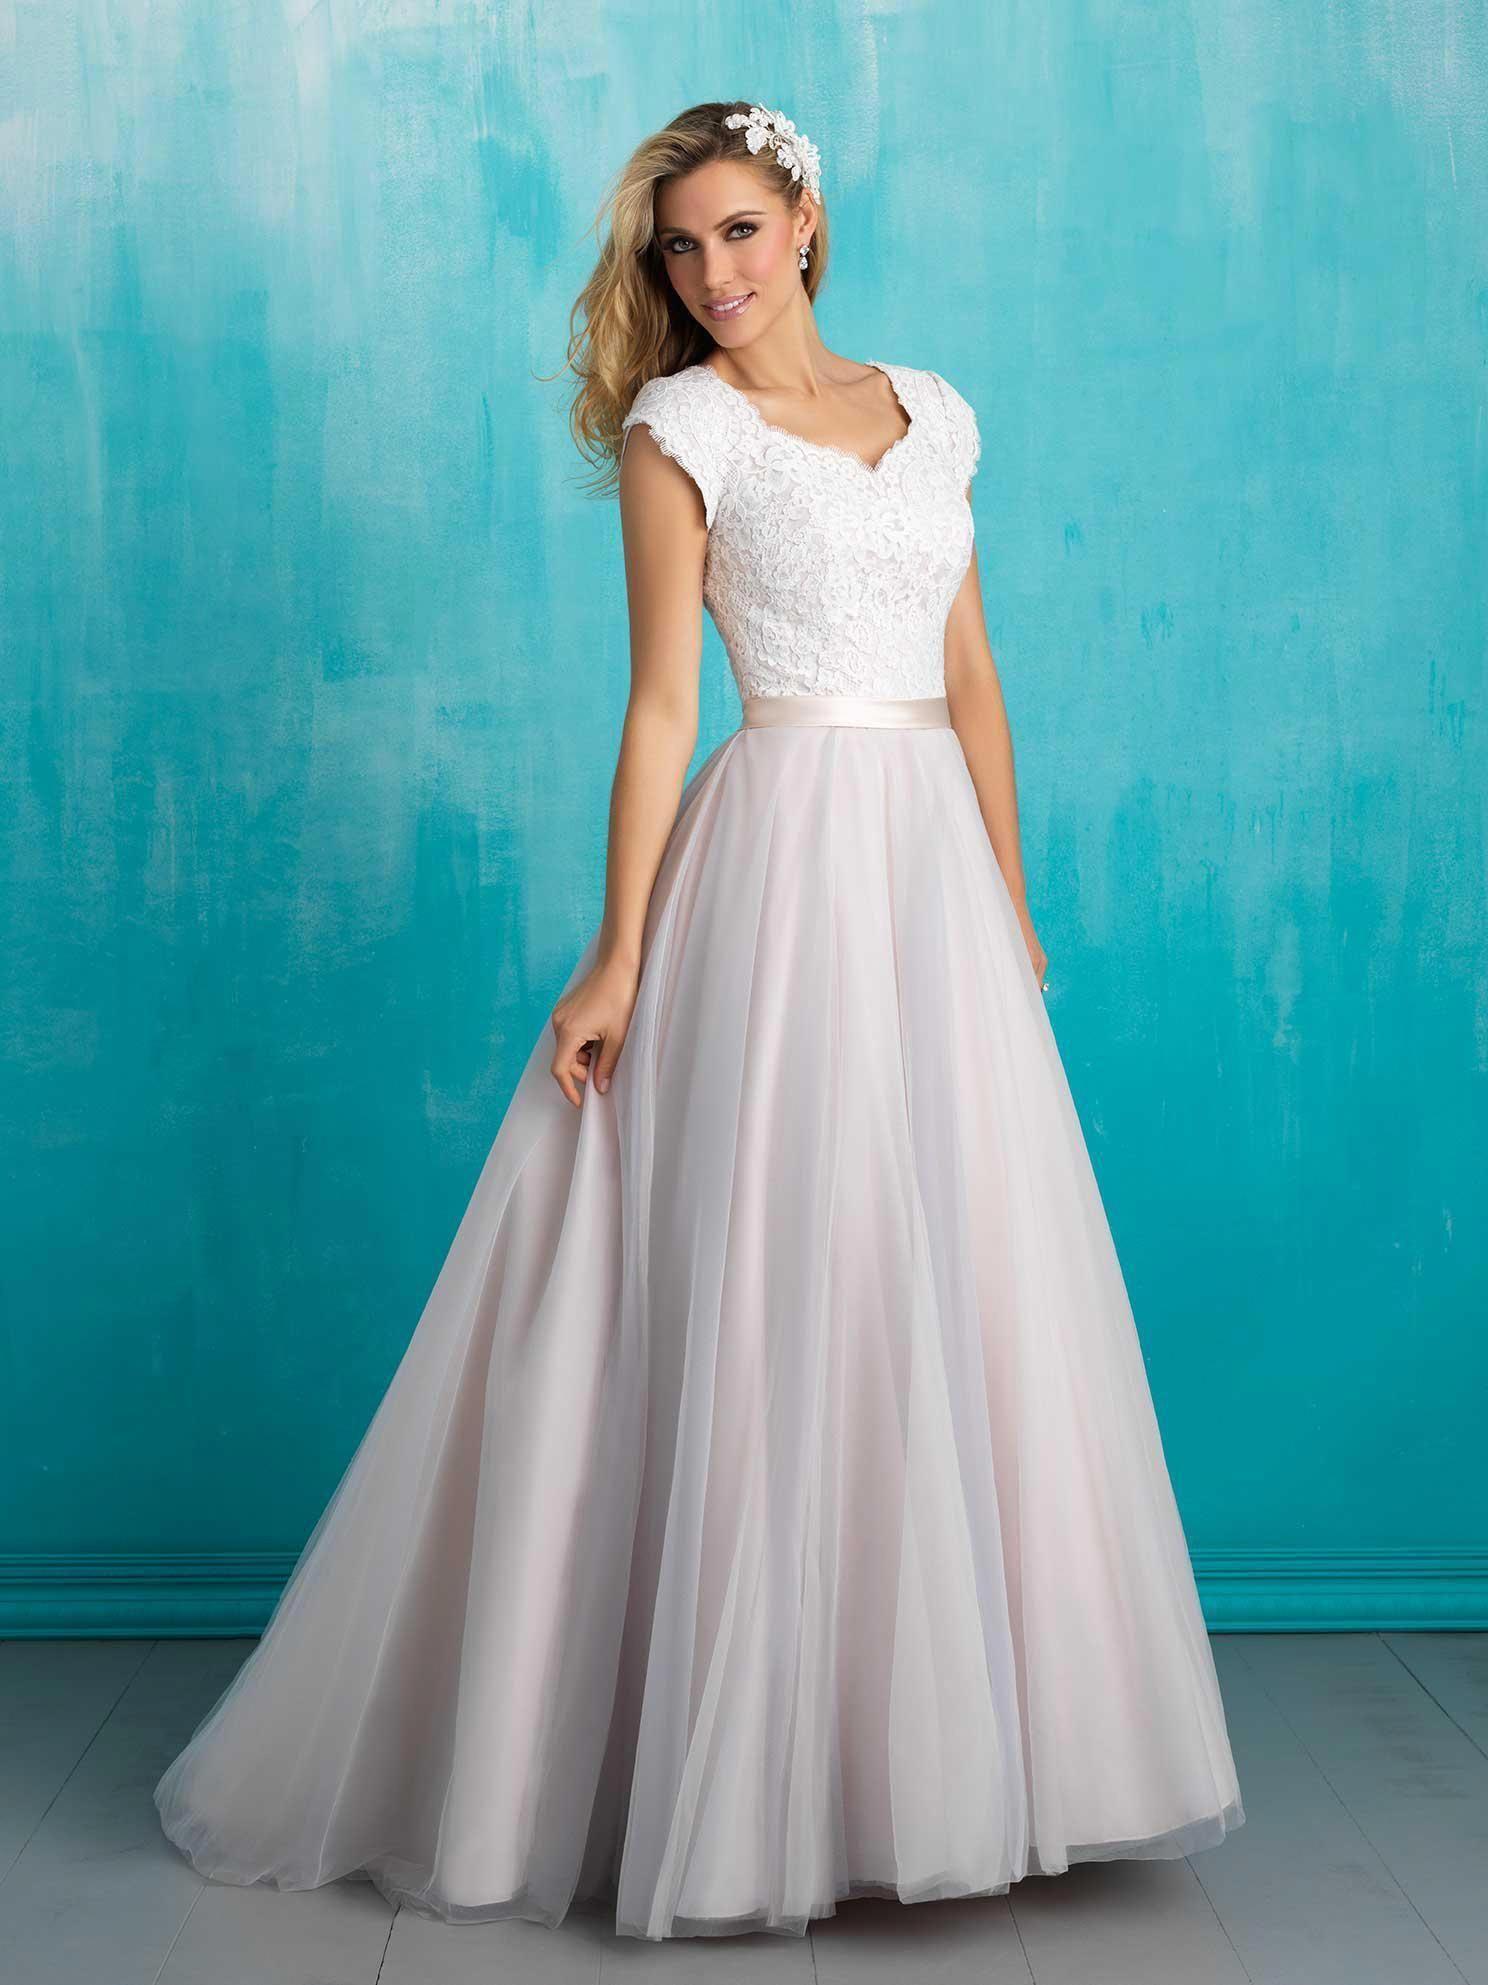 12 Fairy Wedding Dress FROM Beba's EPHEMERALS Collection